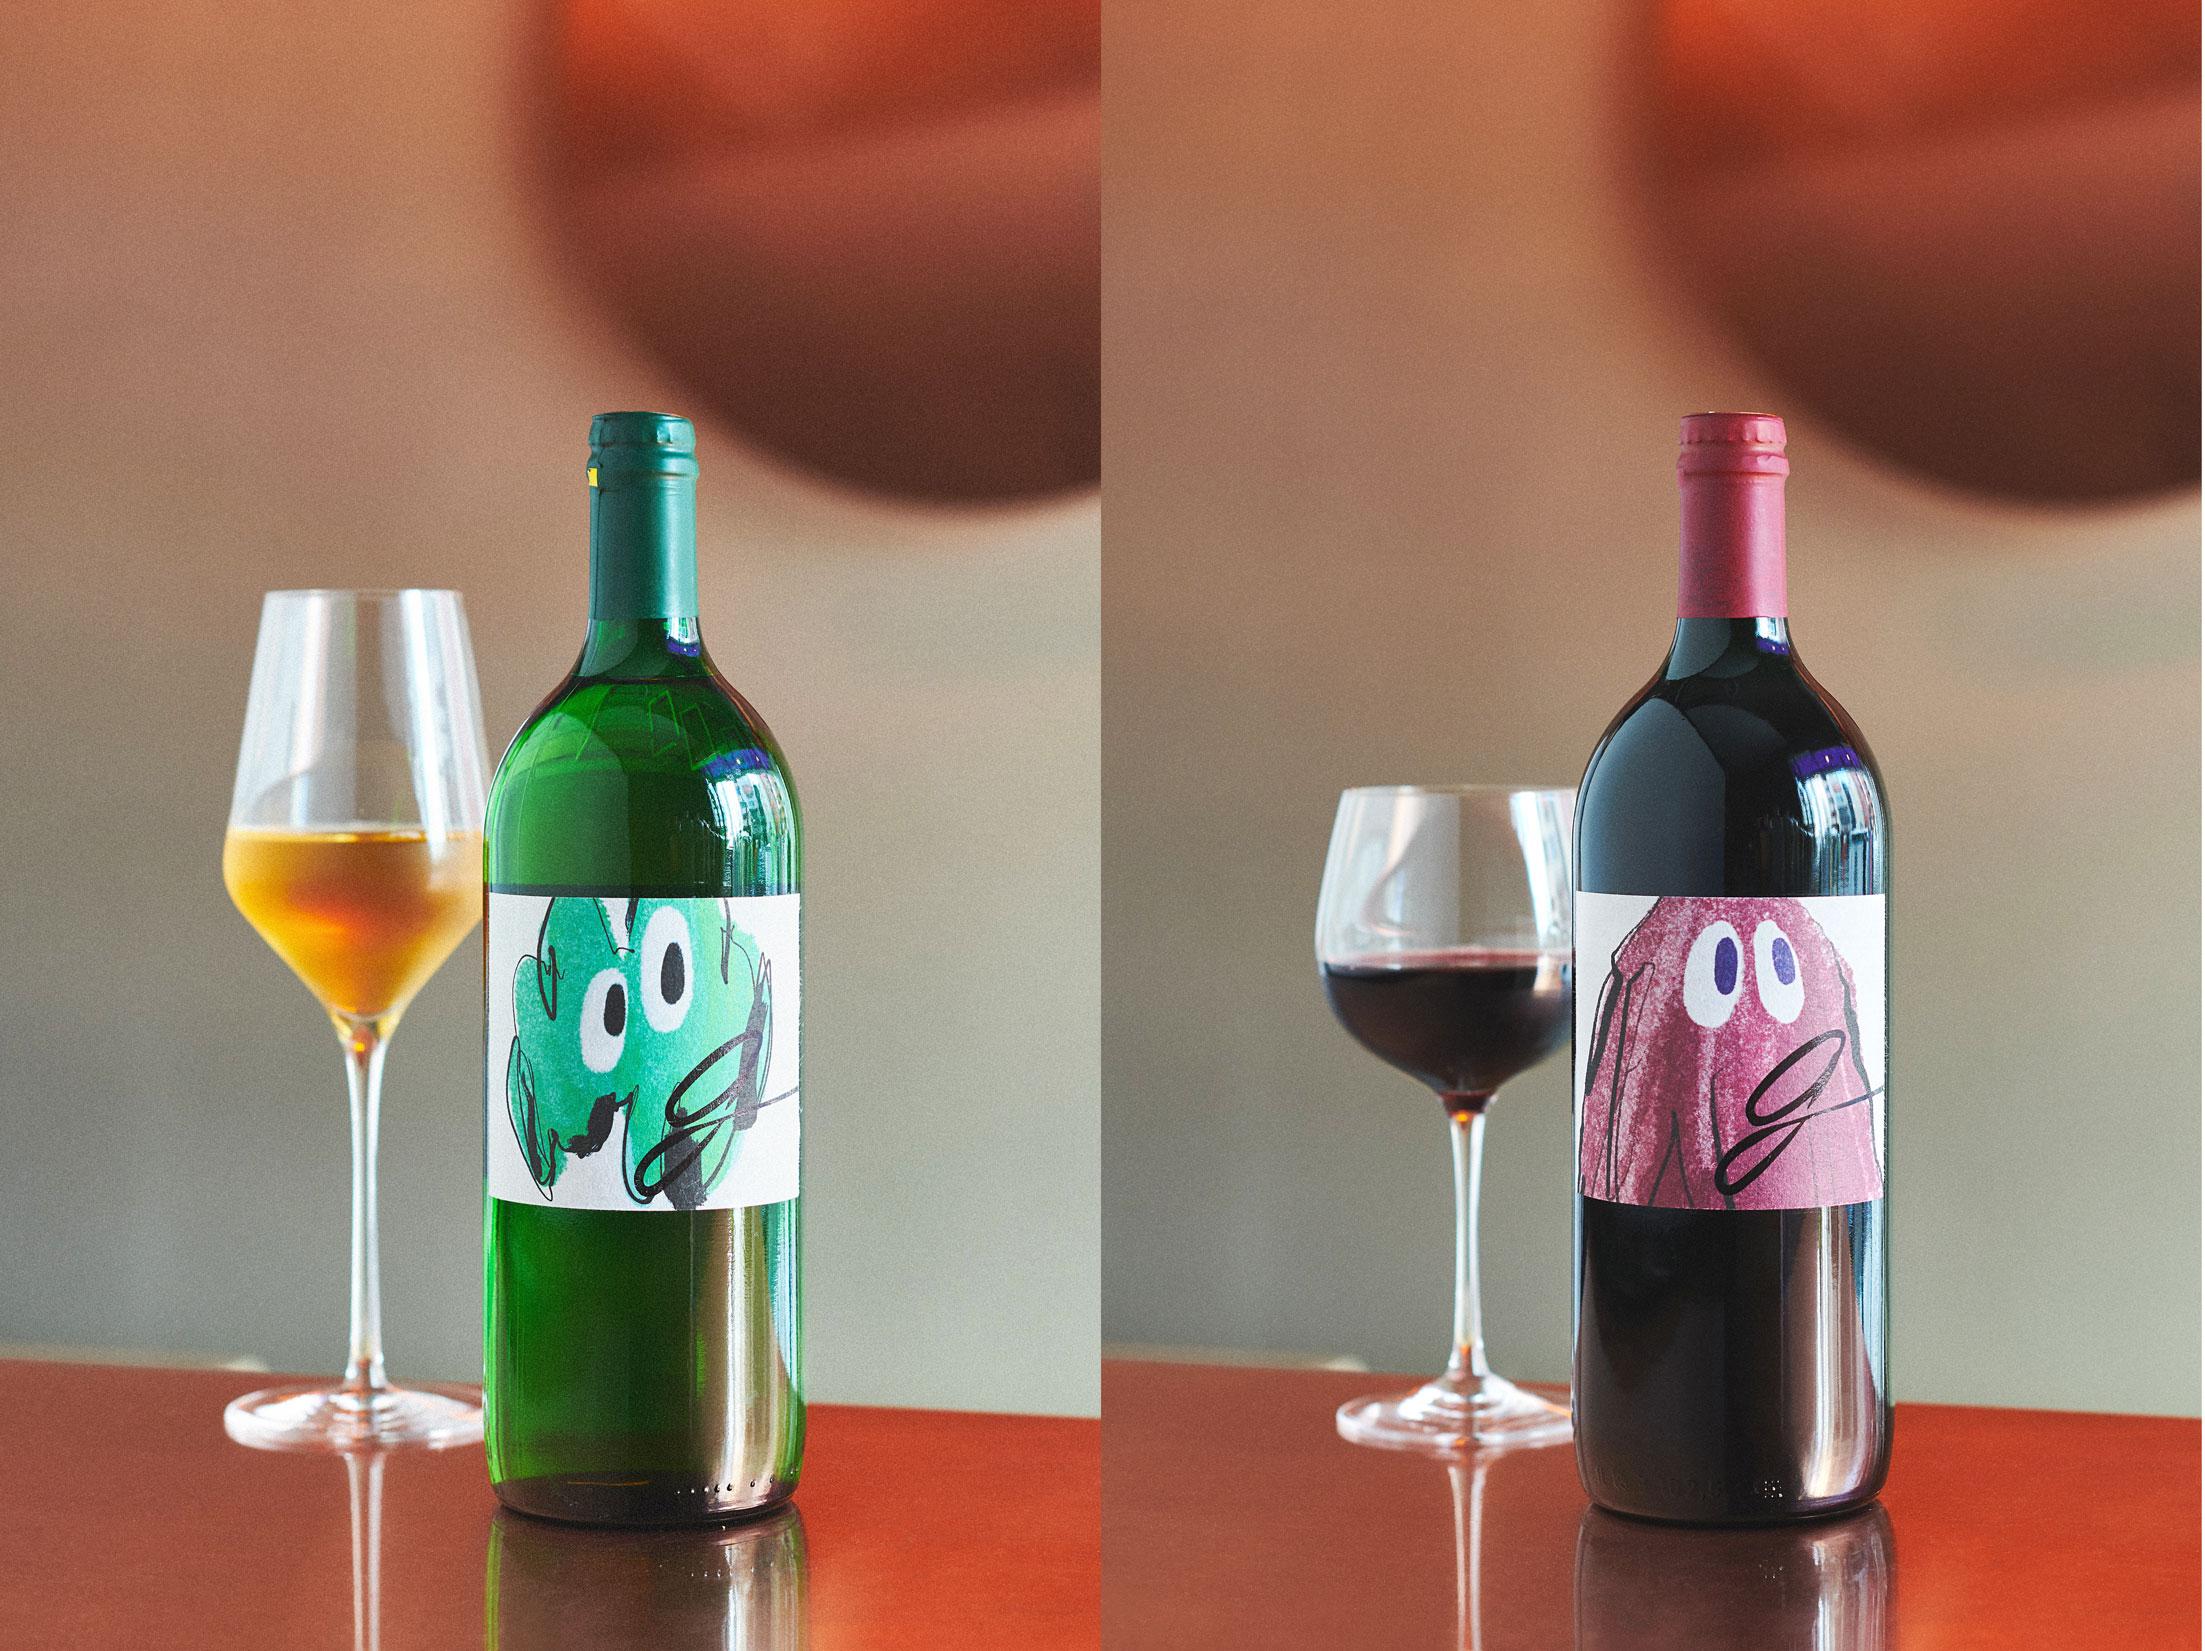 0% non-alcoholic zero alcohol cocktails Roppongi vegan space futuristic design YAR TATO